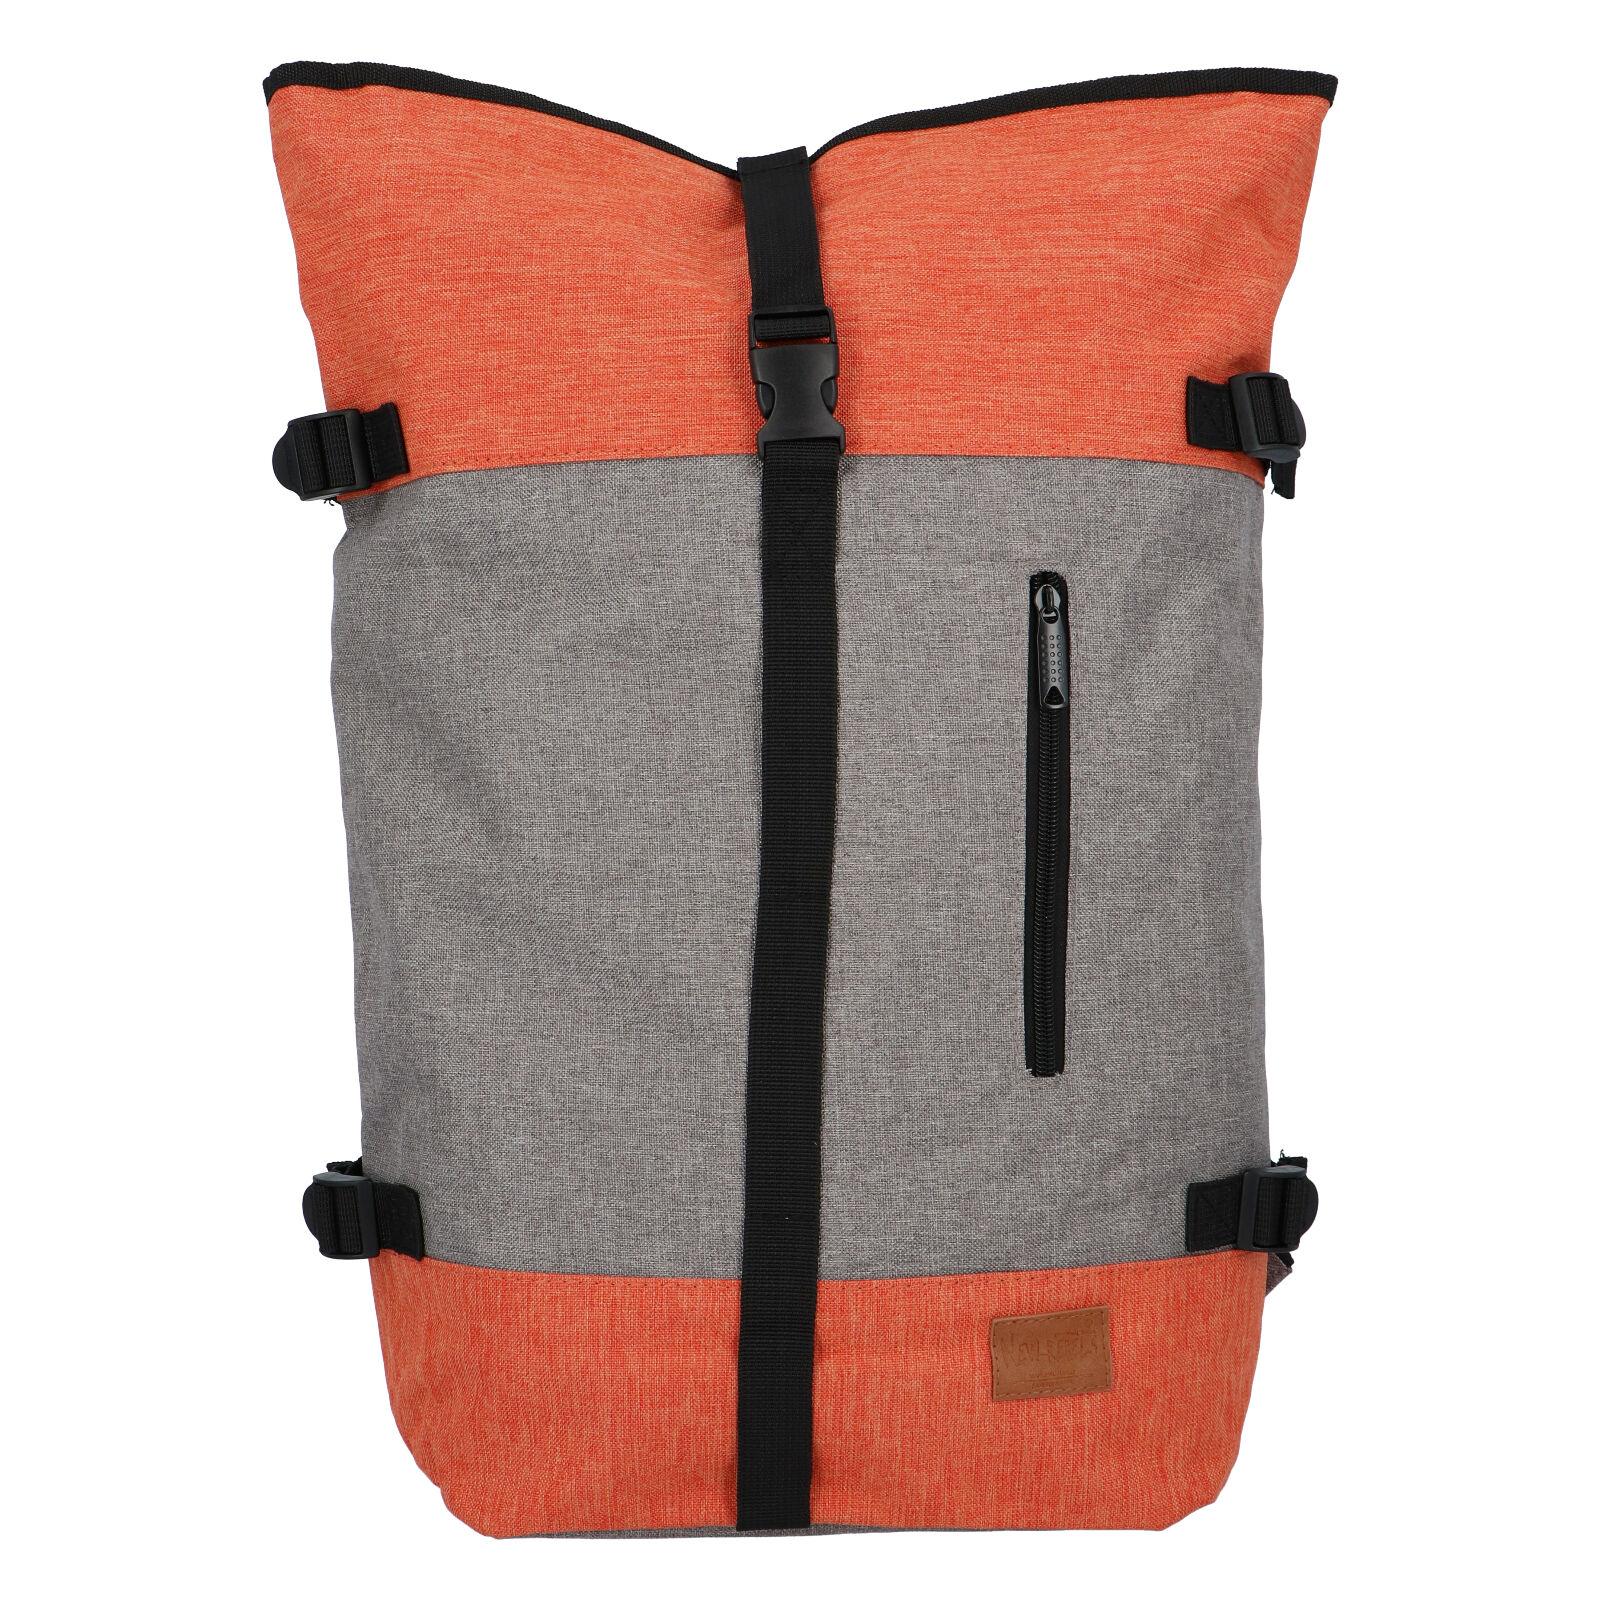 Jedinečný veľký štýlový unisex batoh šedo-oranžová - New Rebels Rebback